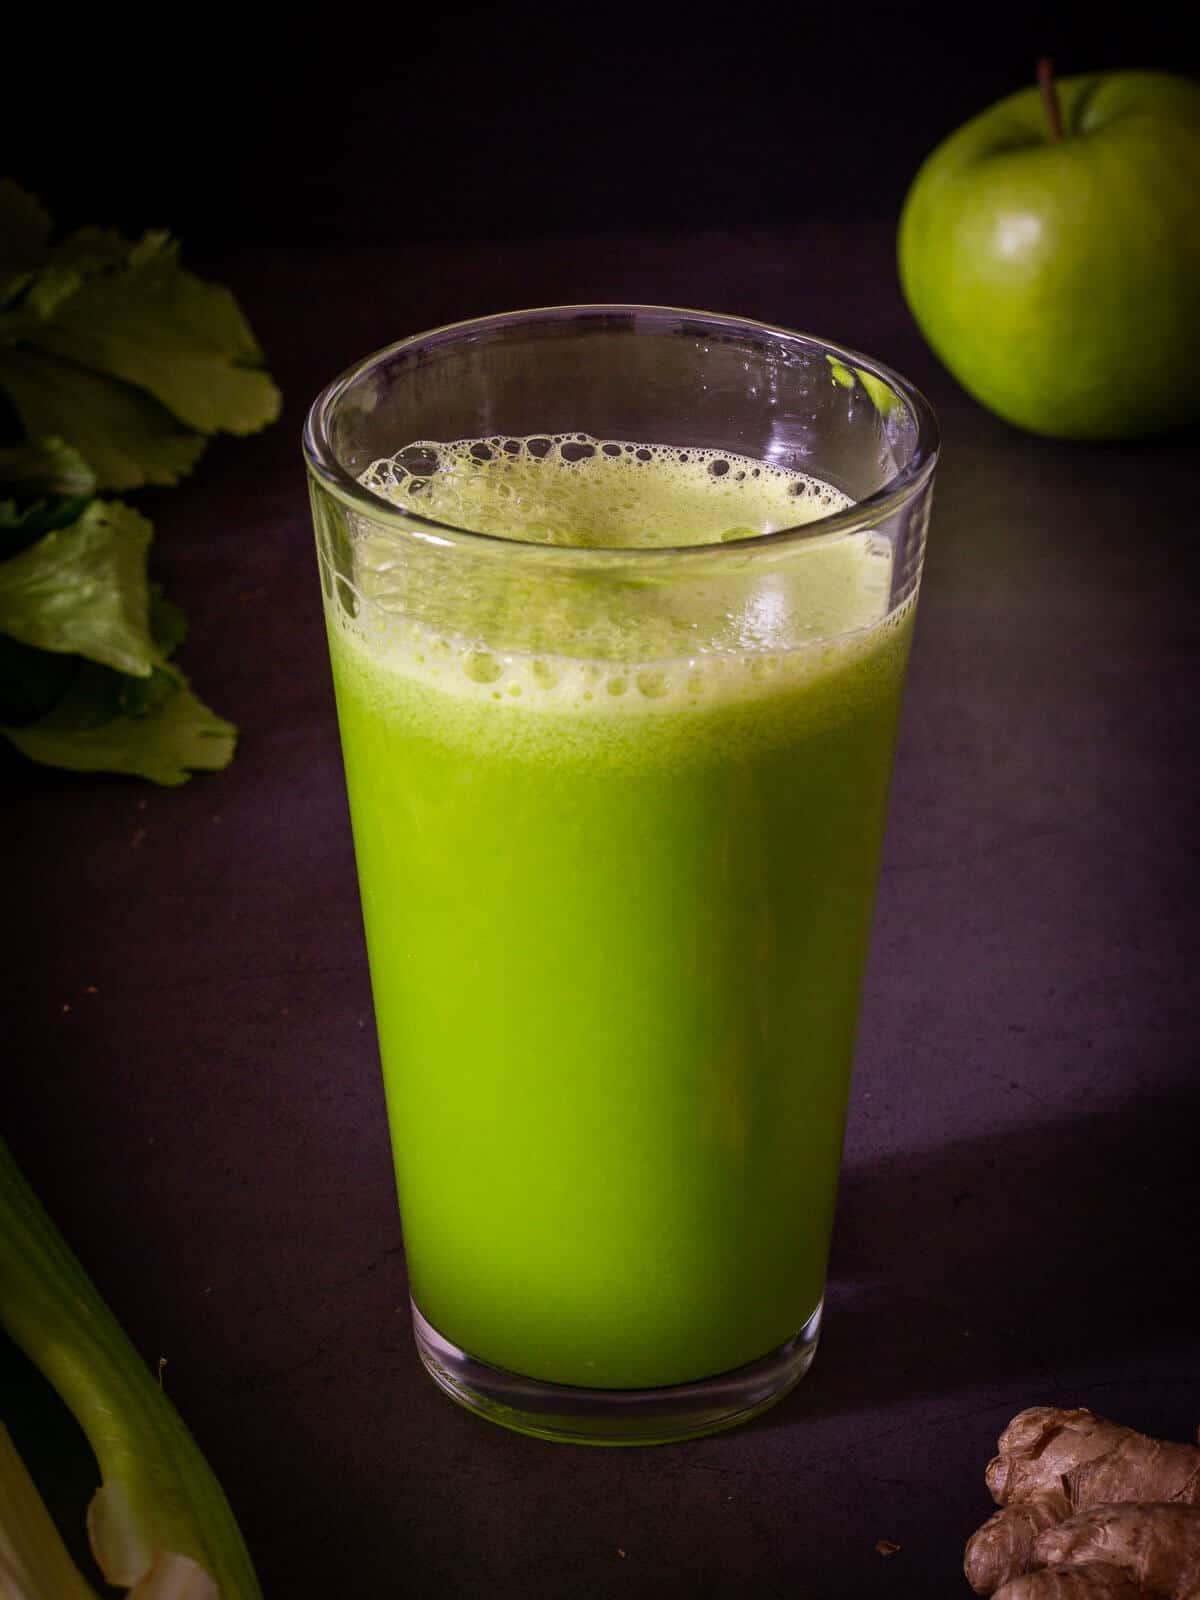 Glass of Morning Celery Juice